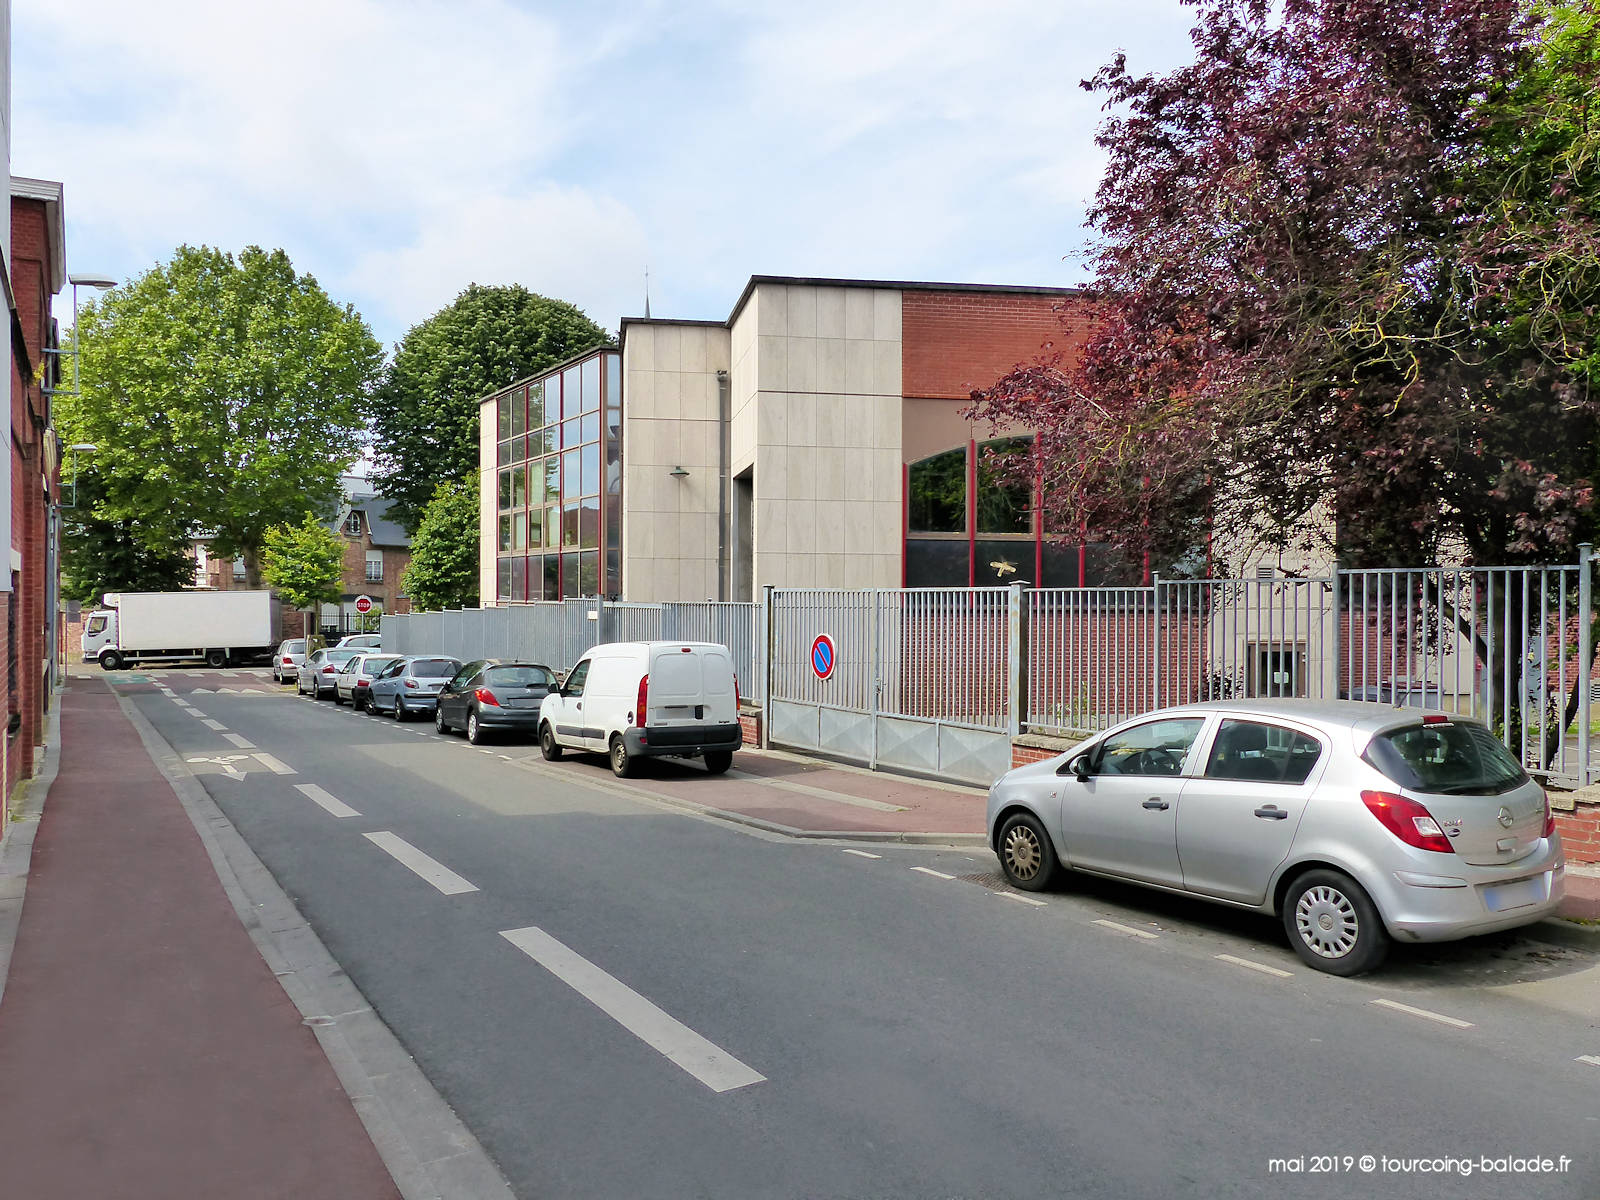 Archives municipales, Tourcoing, rue Guethem